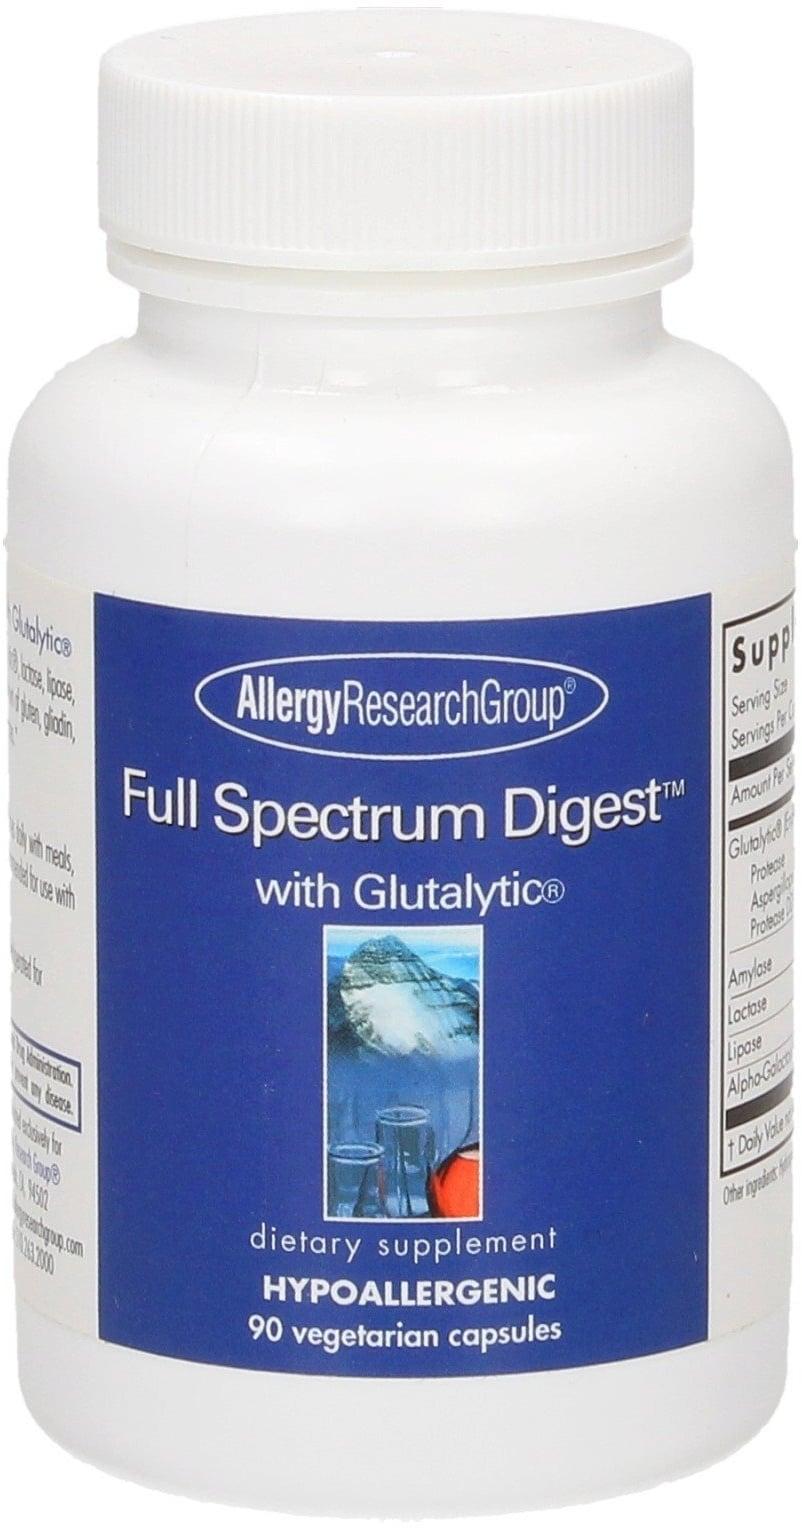 Allergy Research Group Full Spectrum Digest™ 90 veg. Kapseln